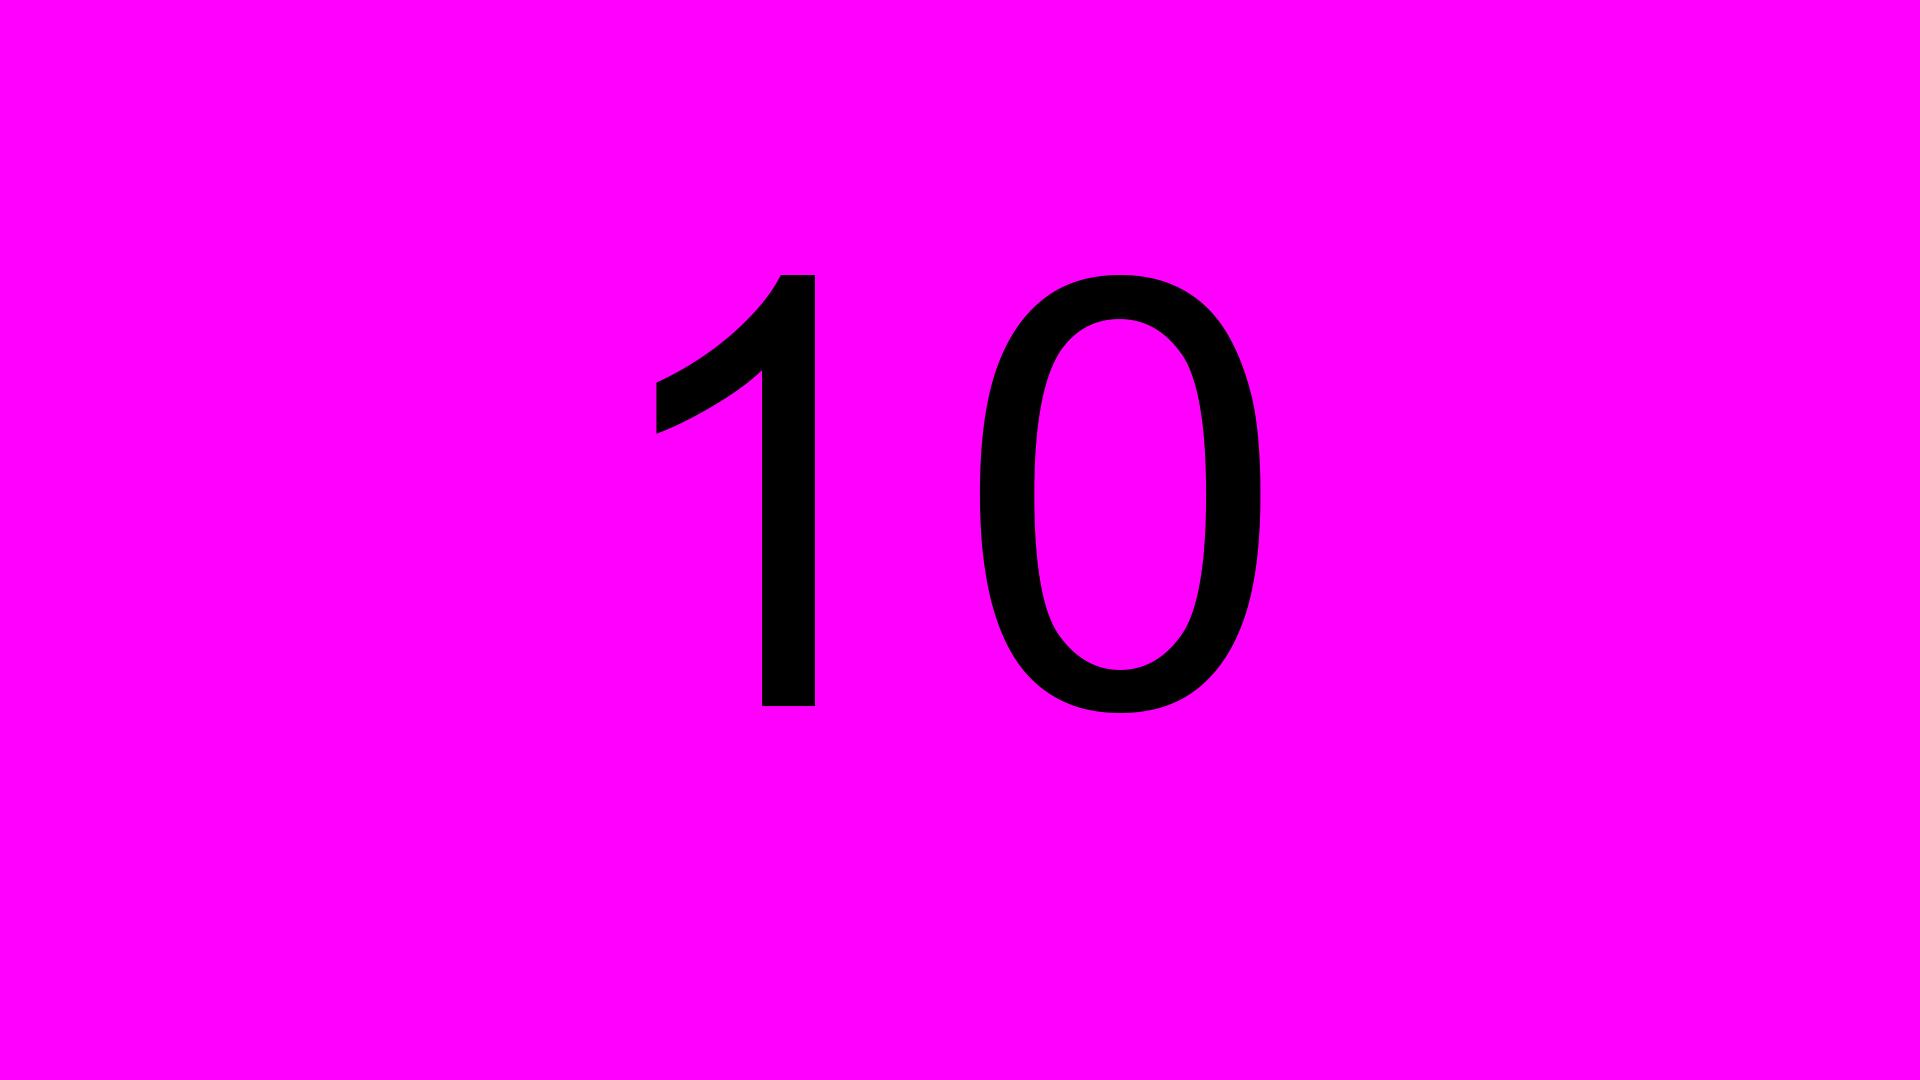 Magenta_10